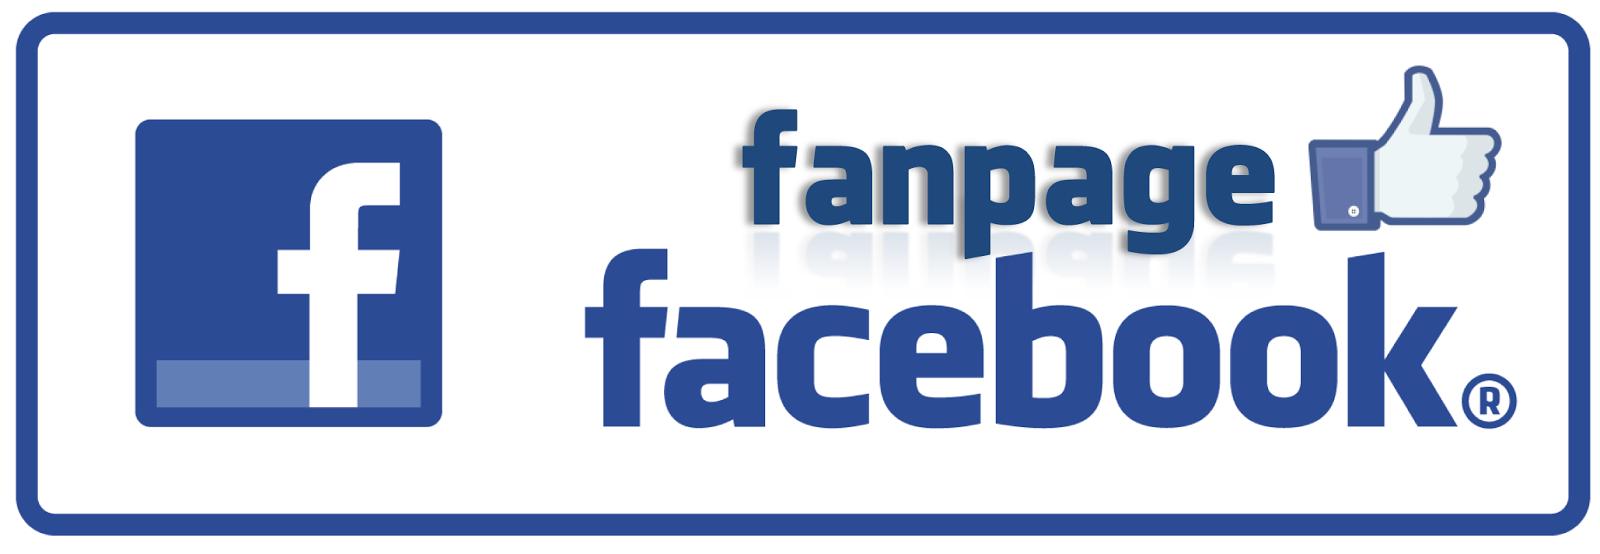 Cara Promosi Fanpage Facebook Tanpa Biaya